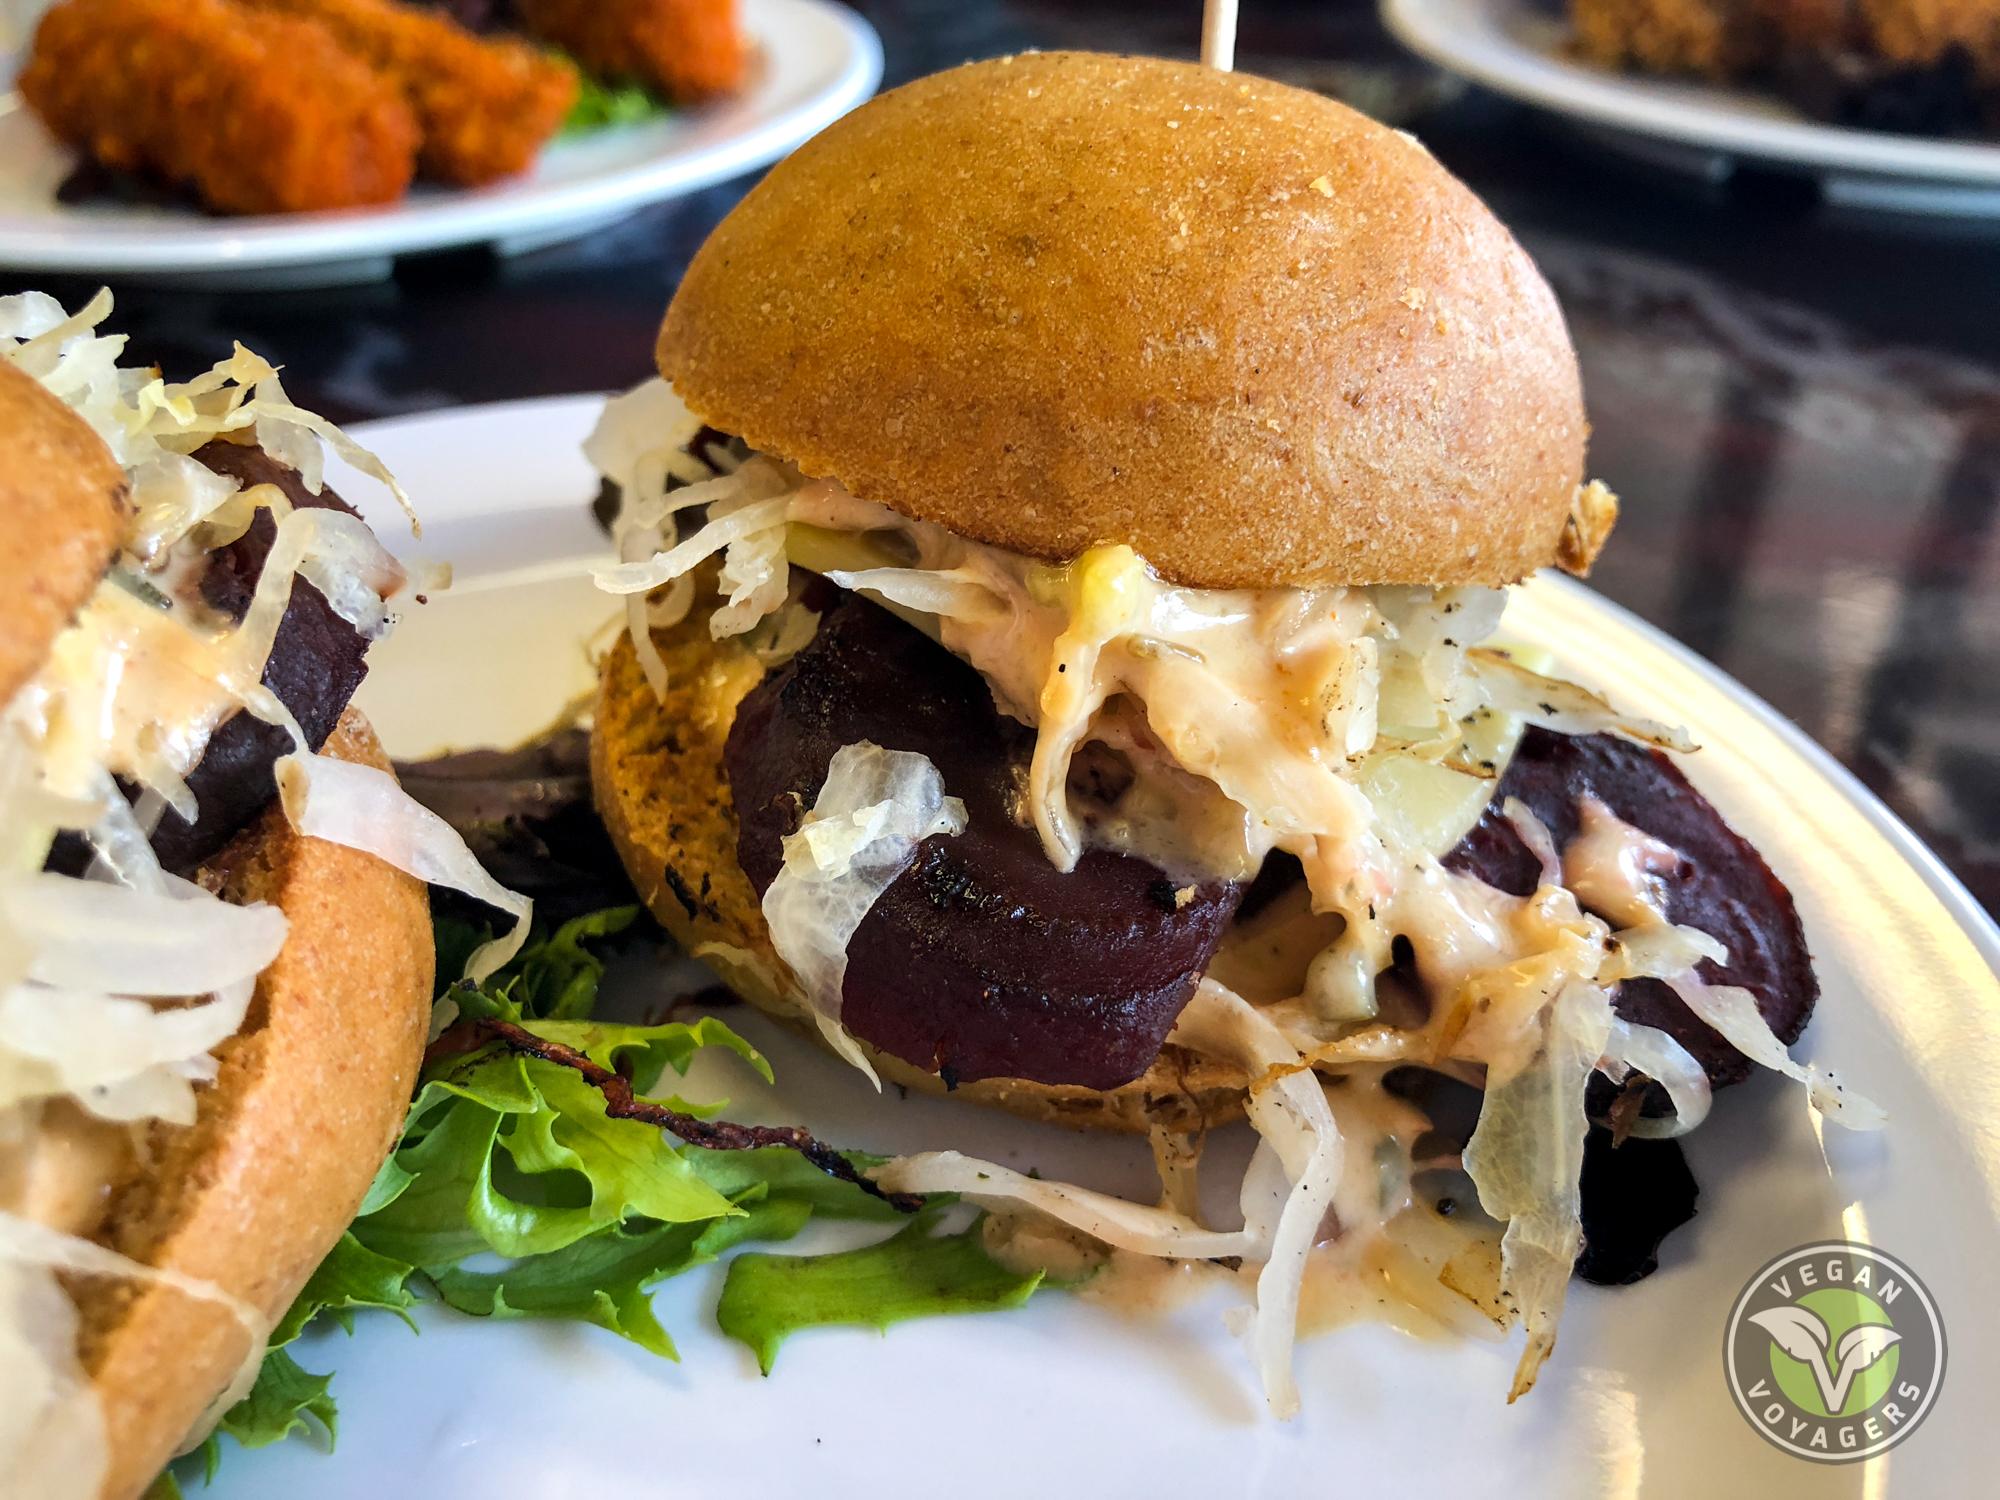 Sanctuary Vegan Cafe | The 7 Best Vegan Reubens in the United States